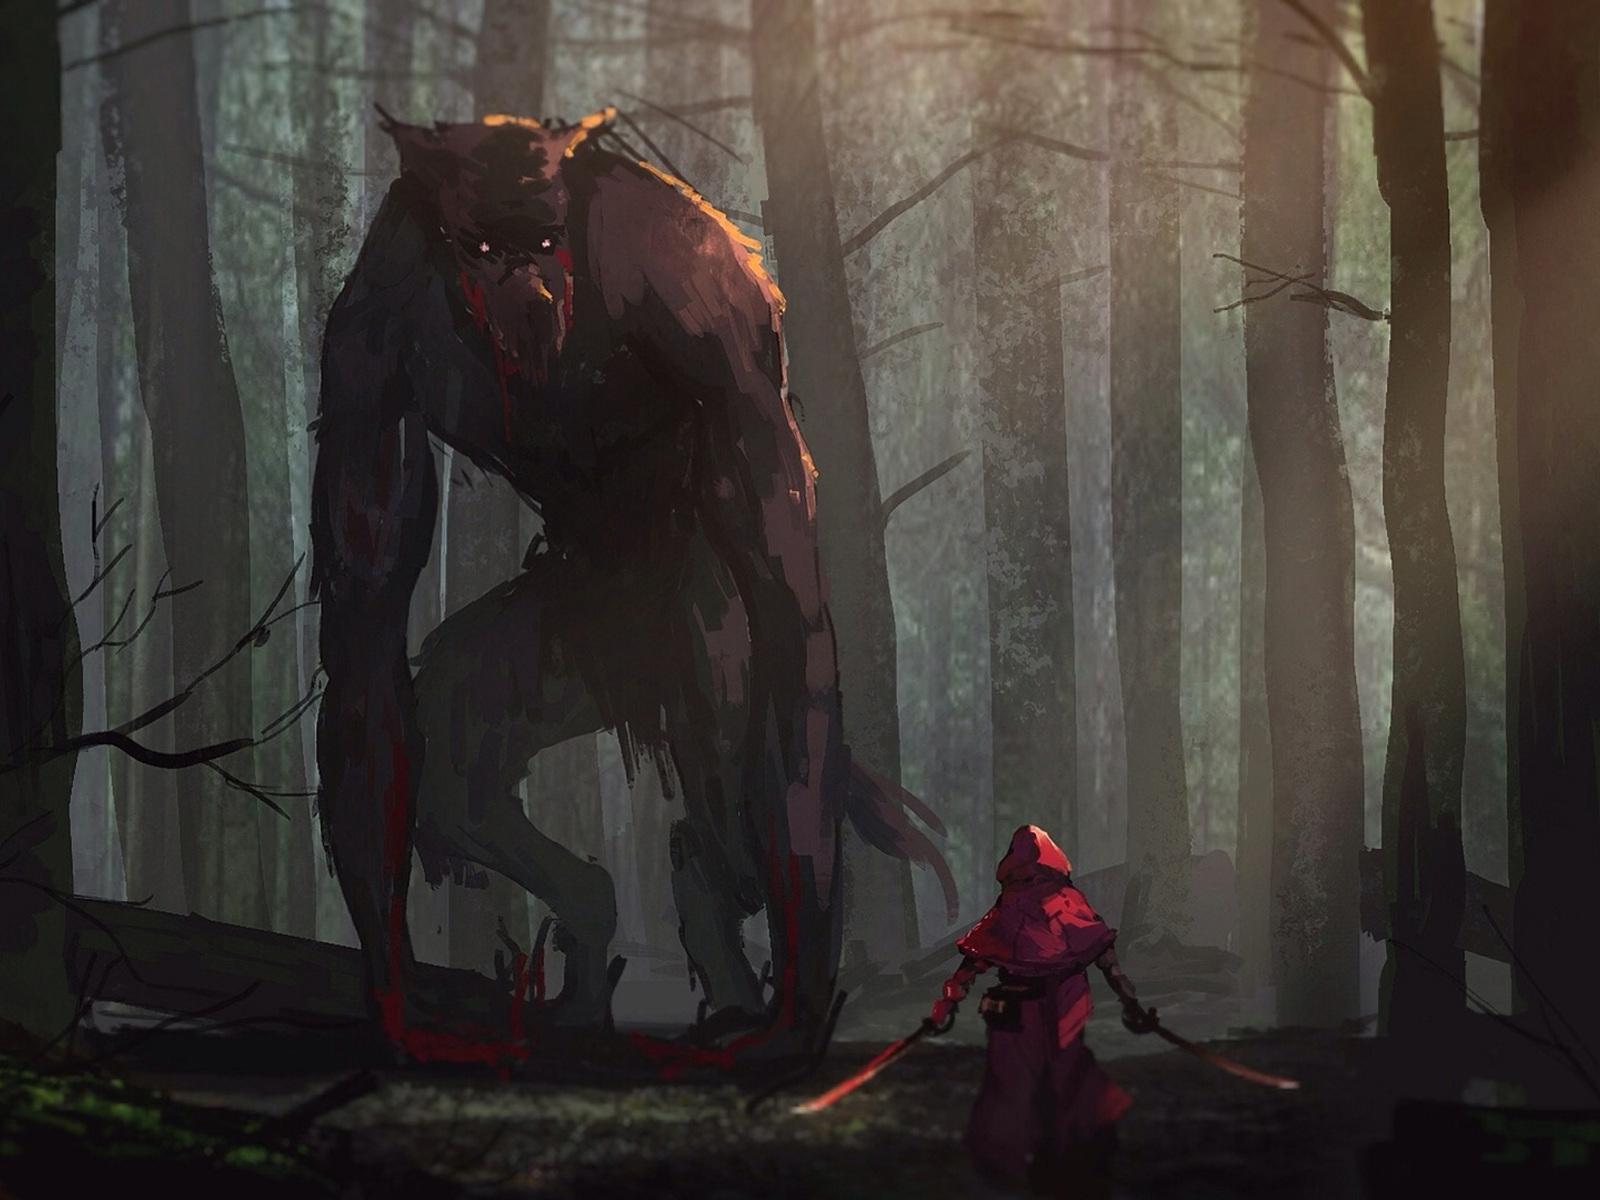 1600x1200 Little Red Riding Hood Vs Werewolves Fairy Tale Artwork